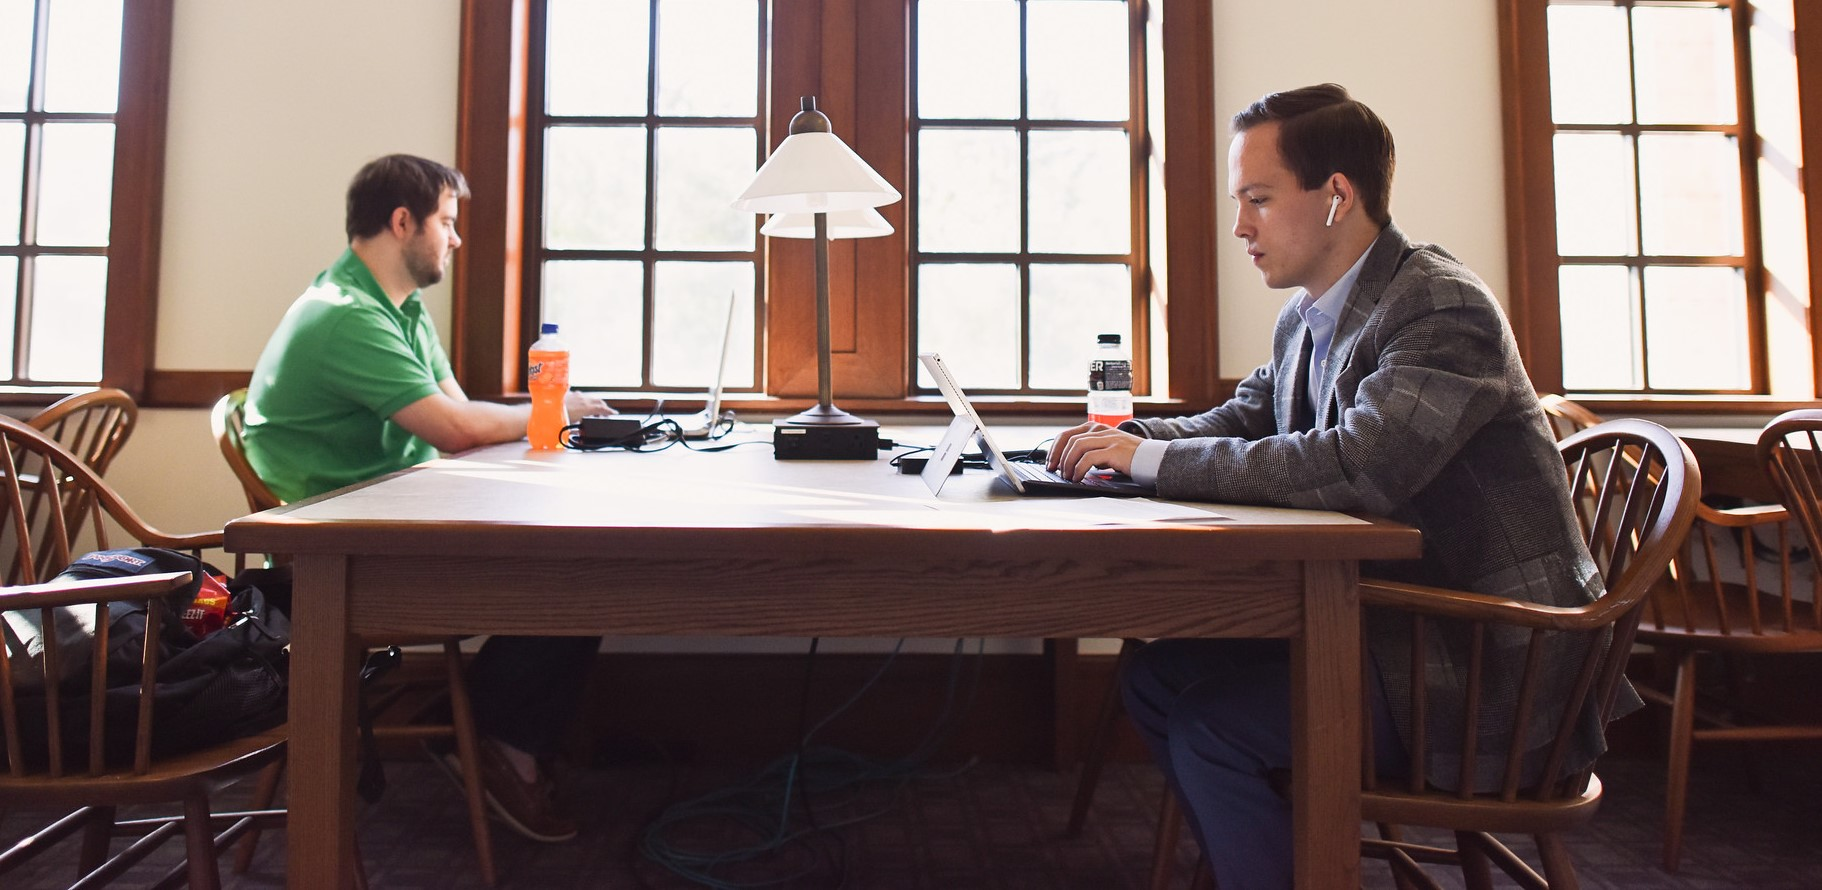 Doctoral dissertation help business